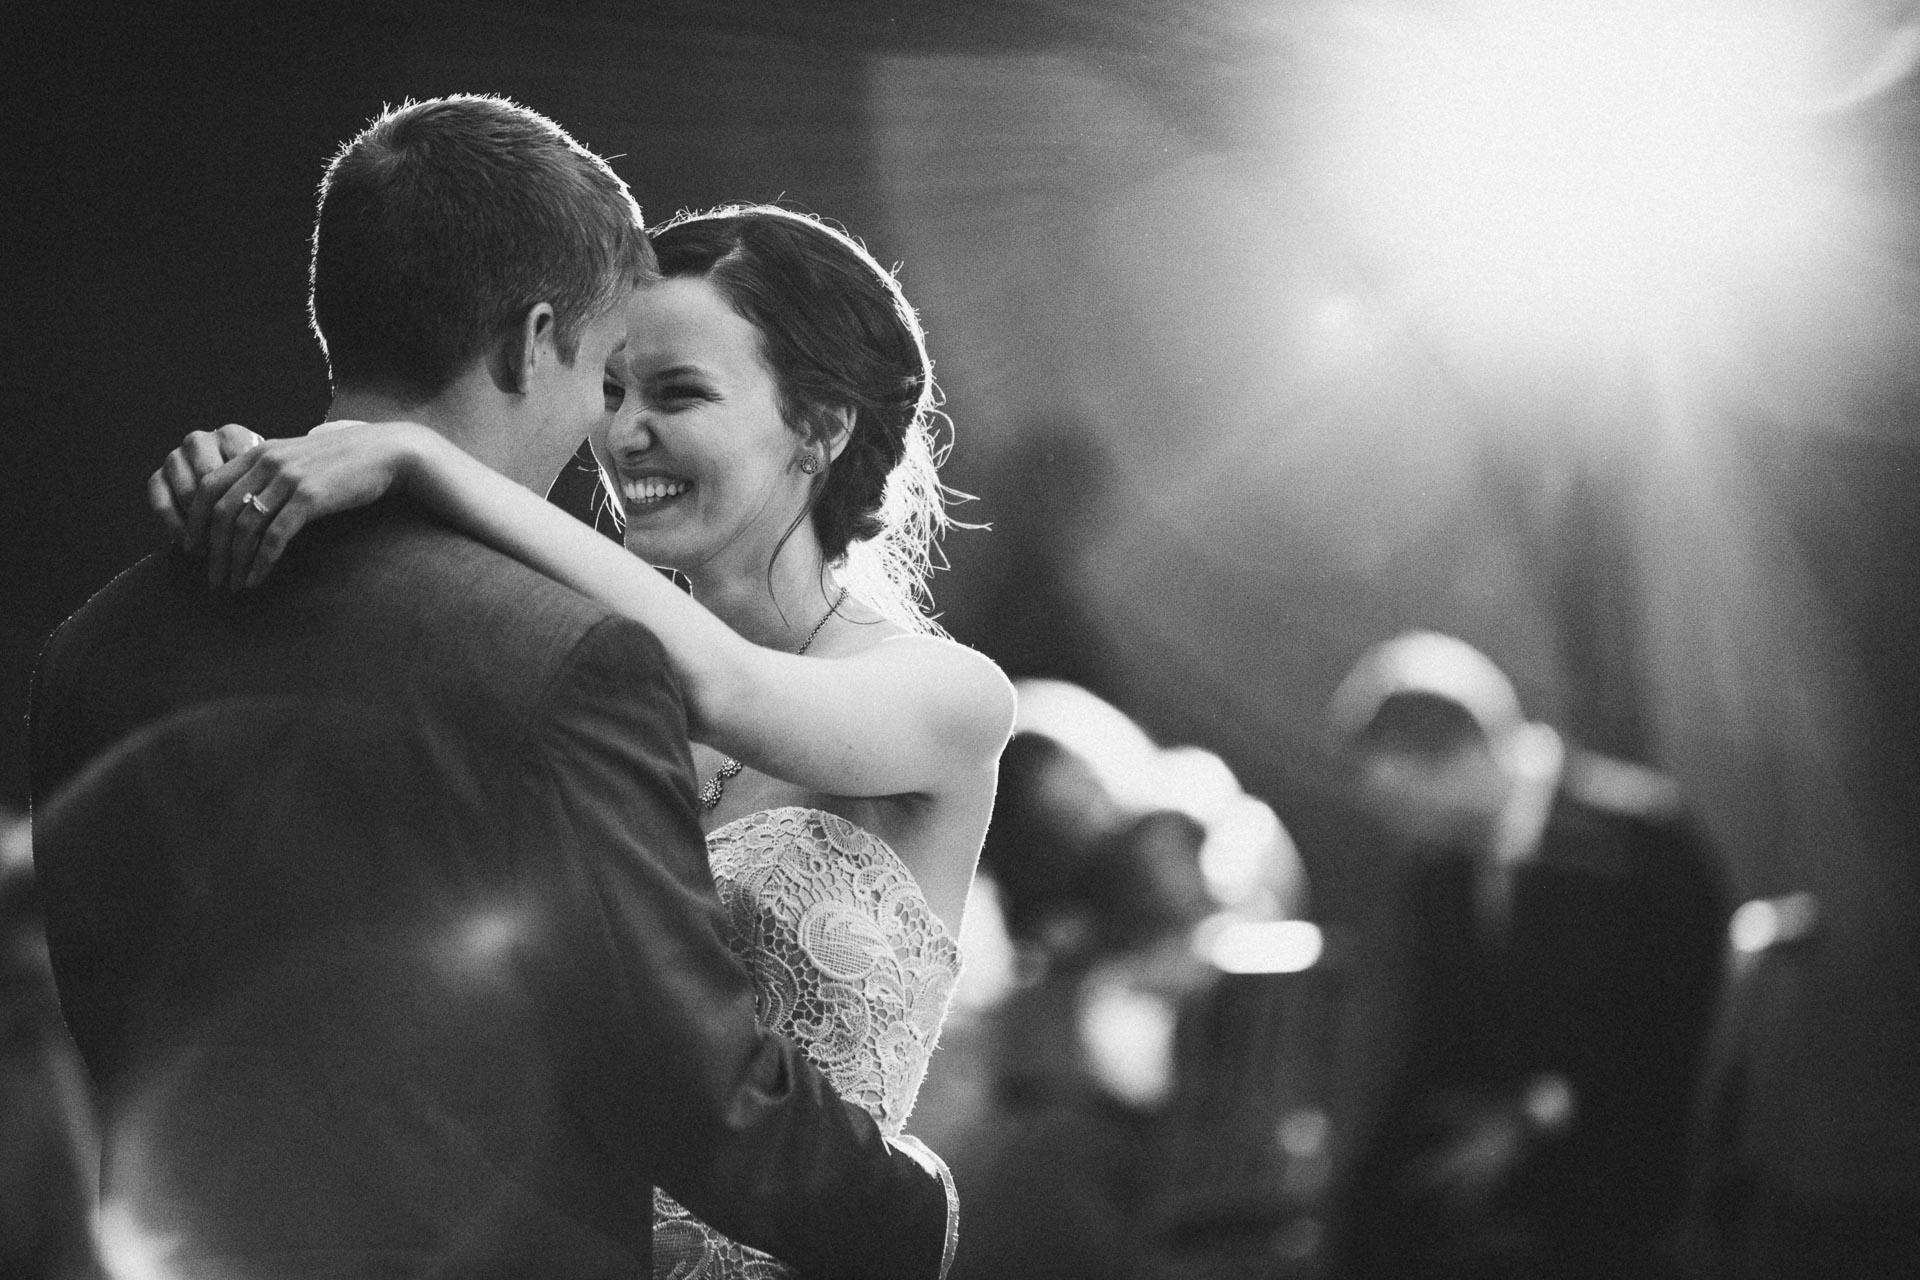 Julia-Michael-Cincinnati-Music-Hall-Wedding-128@2x.jpg